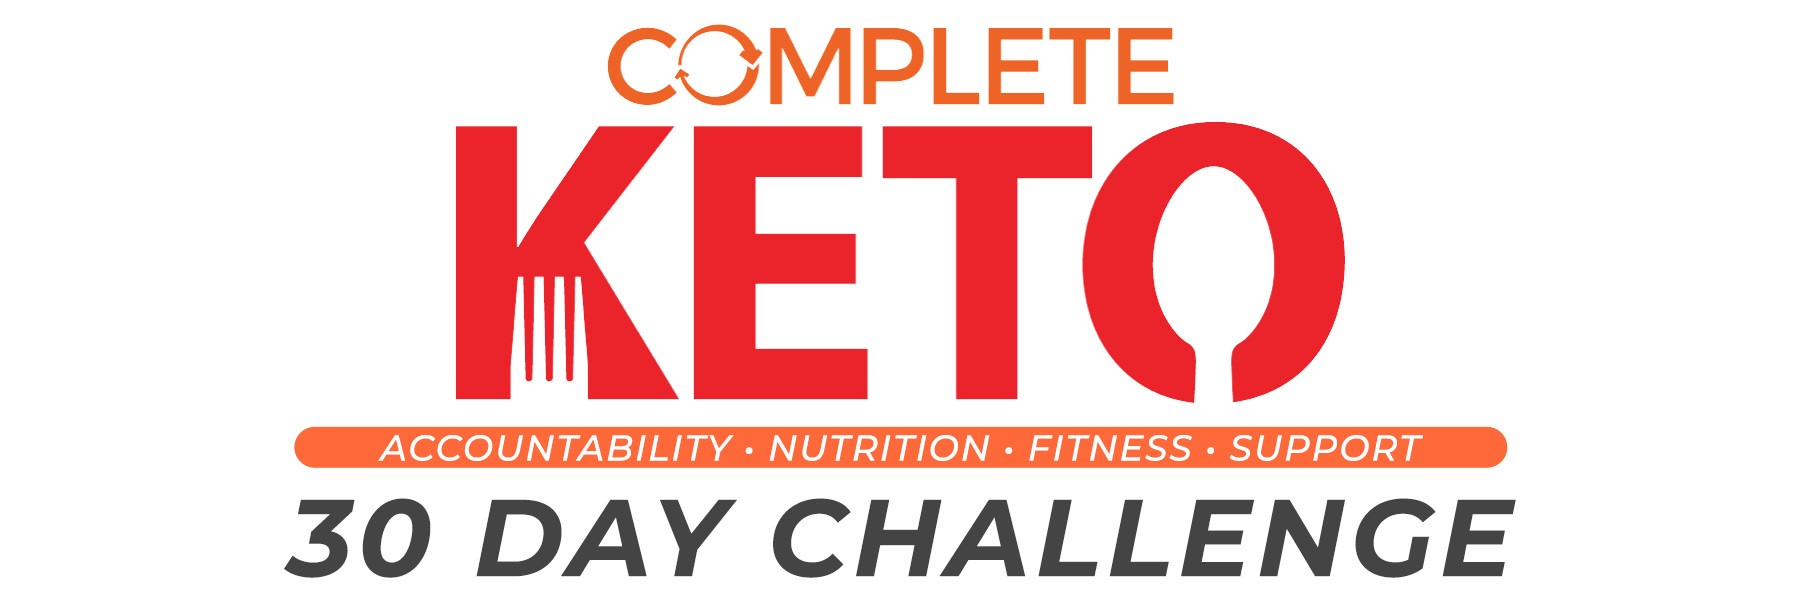 CK30 Challenge